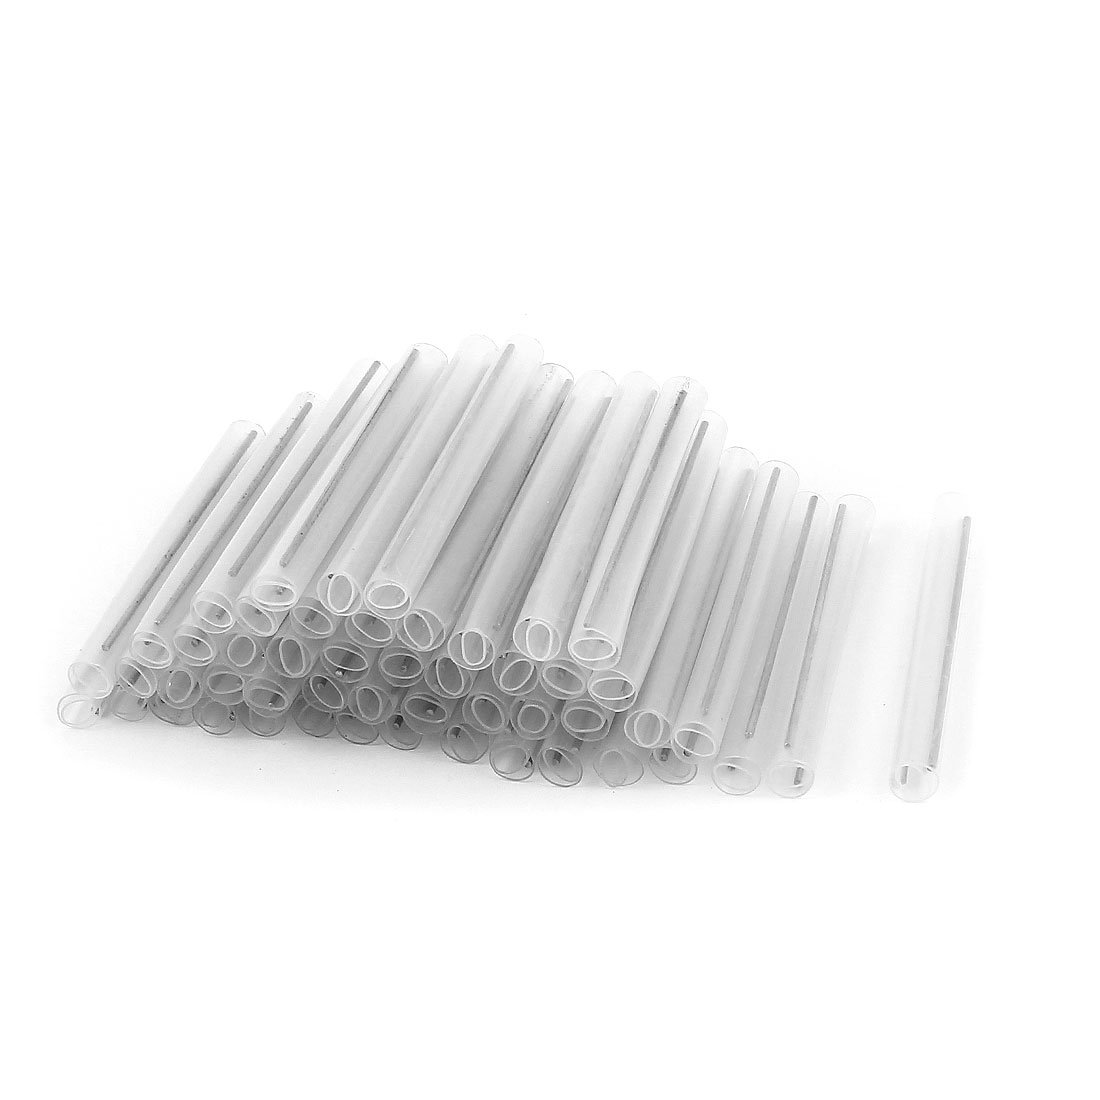 100pcs gaine protection tube raccord Fibre Optique tube thermorétractable 4cm